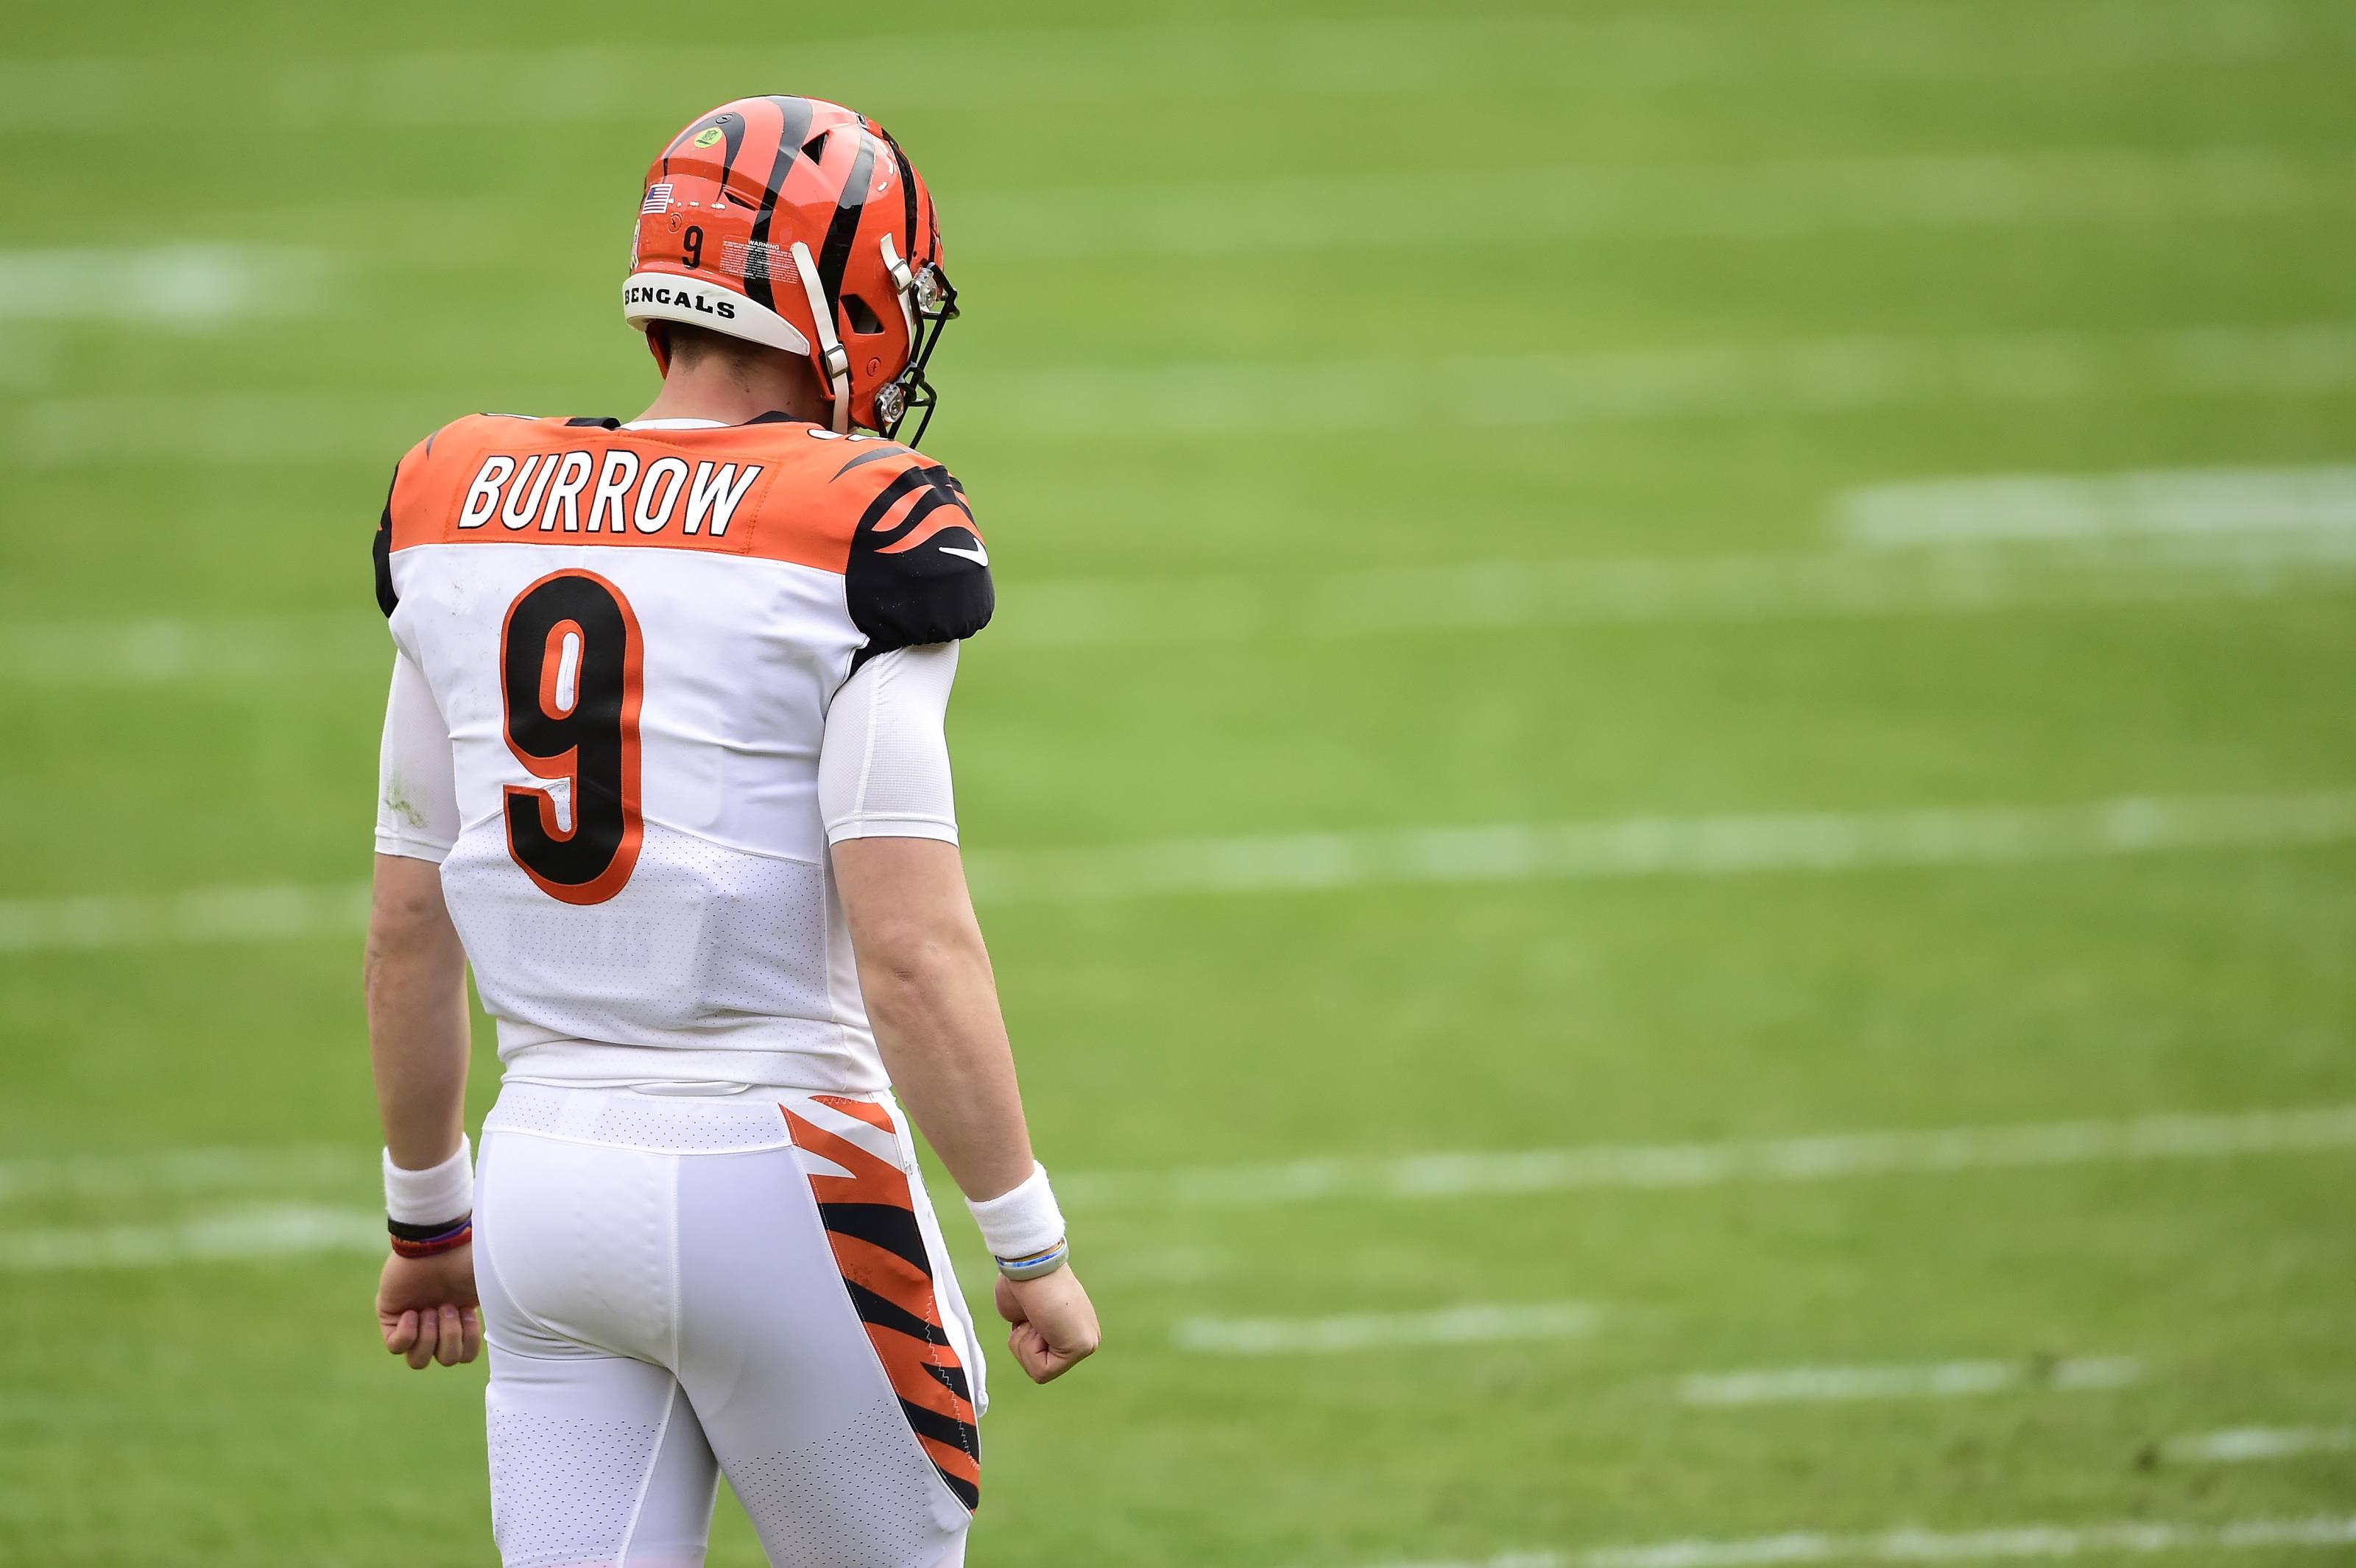 Joe Burrow Cincy Bengals NFL Minggu 1 Hoem Anjing Anjing Texans Colts Giants Lions Raiders